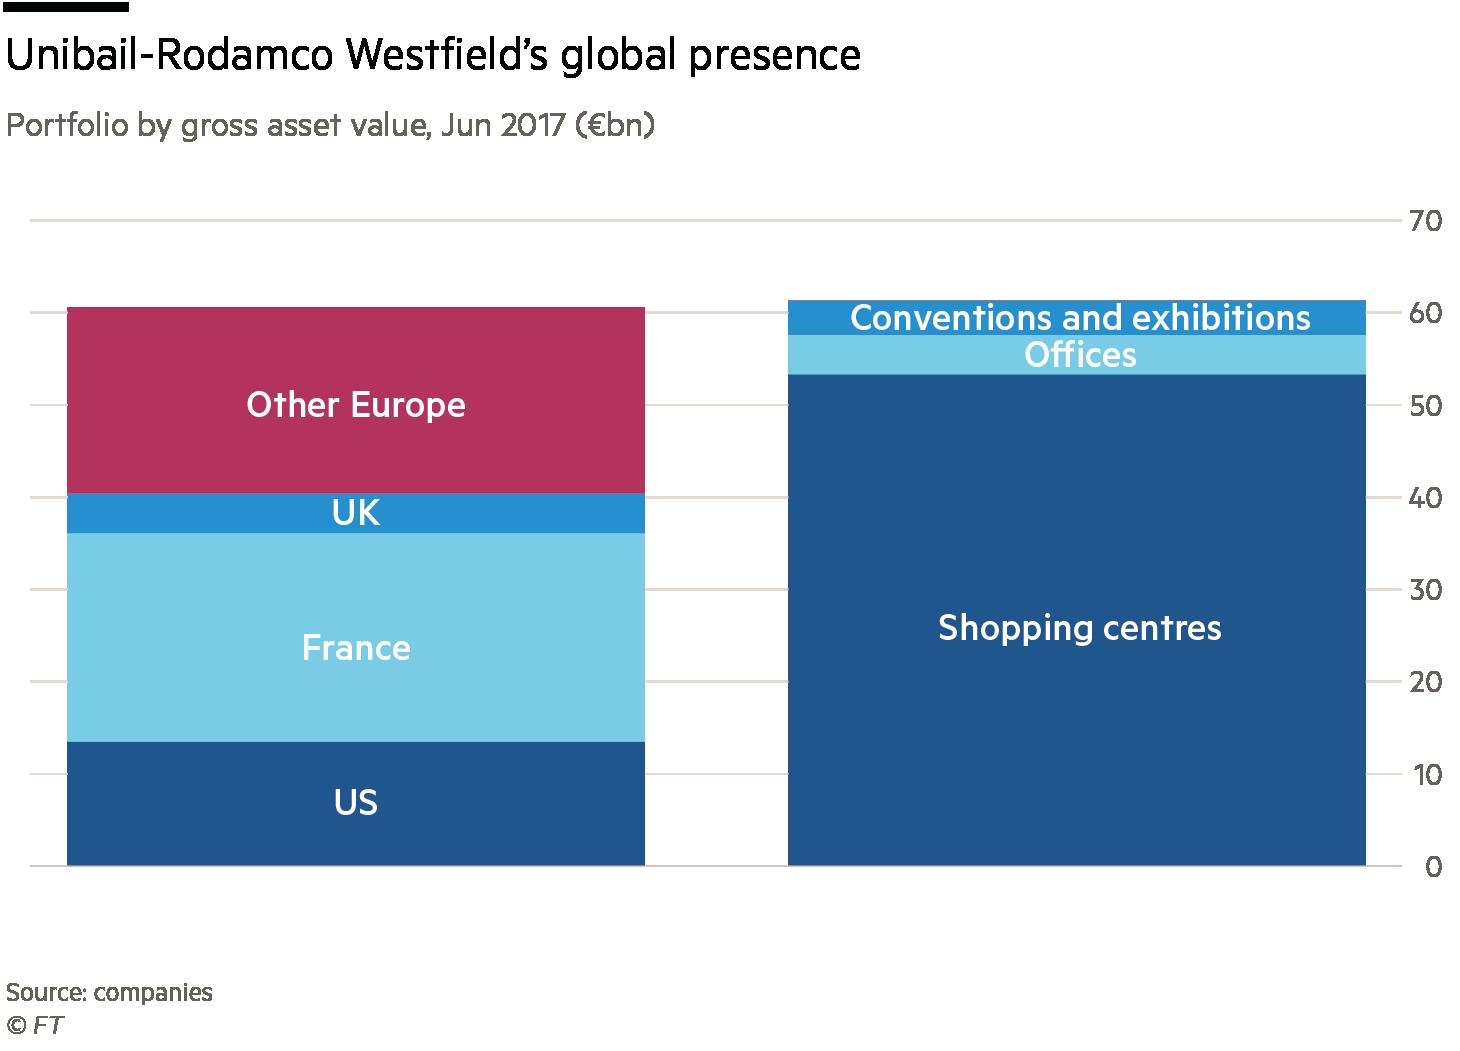 Unibail-Rodamco Westfield chart